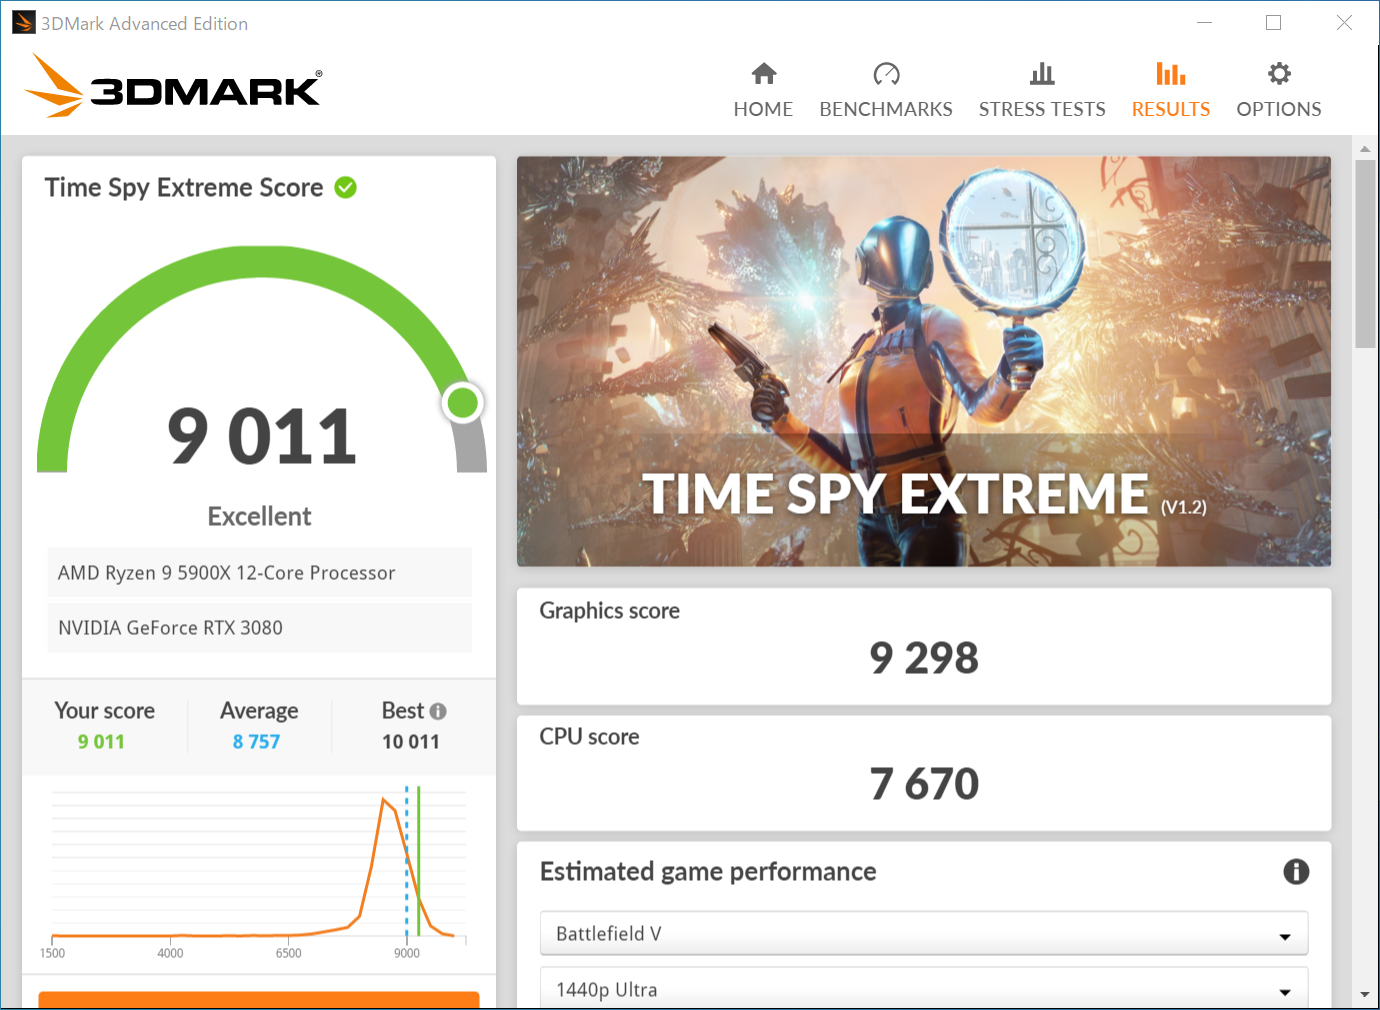 3DMarkのFire StrikeとTime Spyの結果。どちらも良好なスコアで、Ryzen 9 5900XとRTX 3080の性能を十分引き出せている